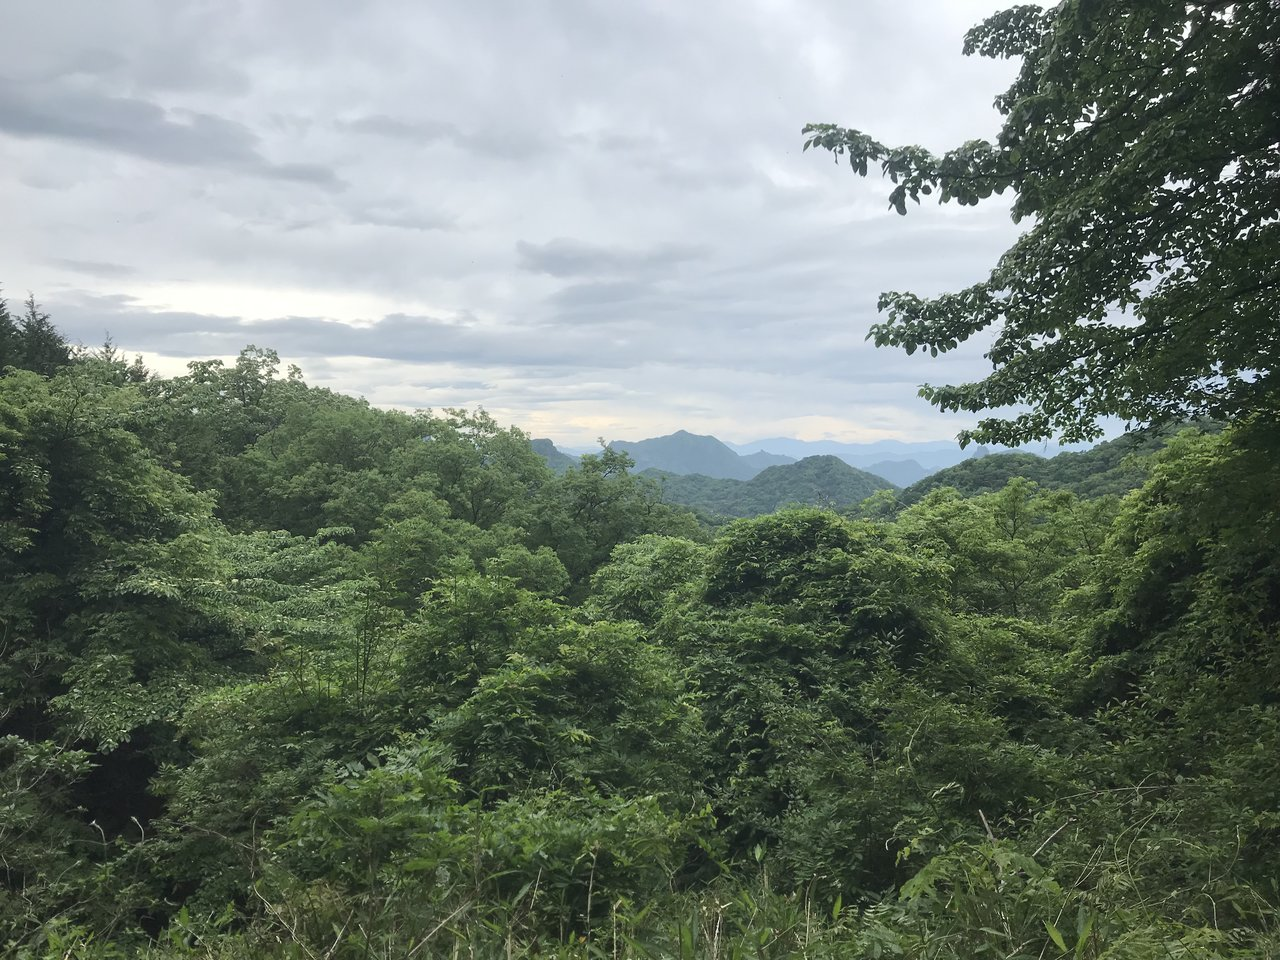 Forest near Yokokawa   Photo taken by Pui san C